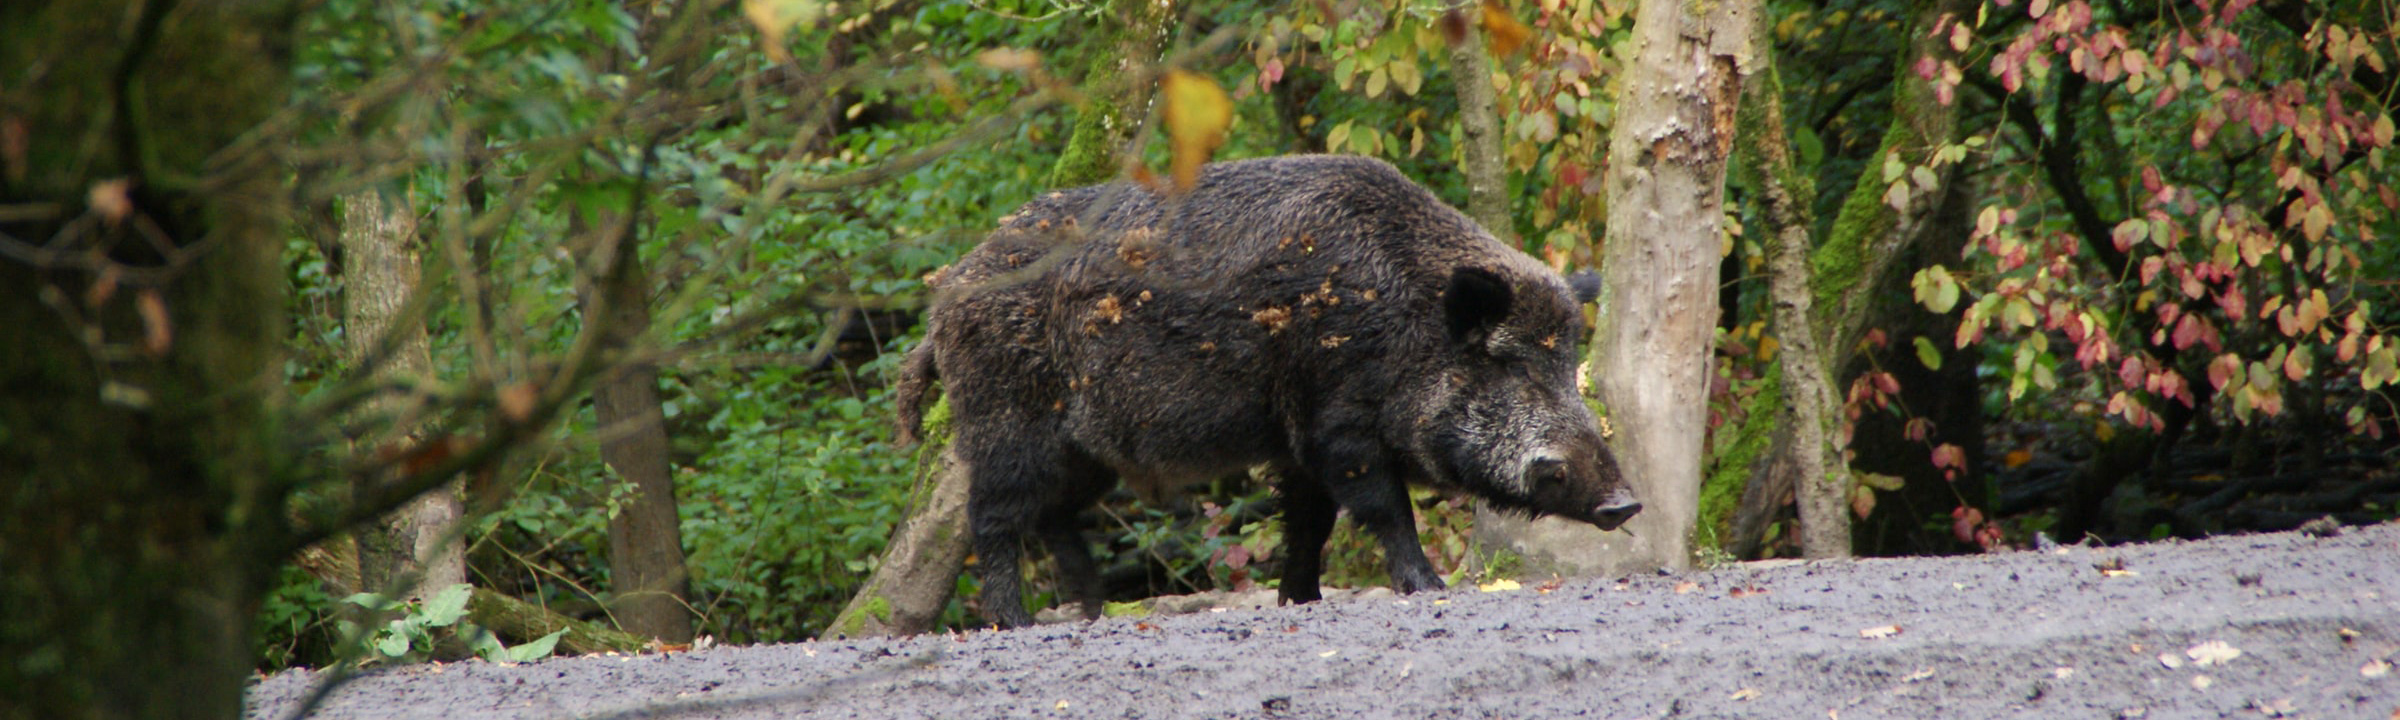 A wild hog walking along a trail.